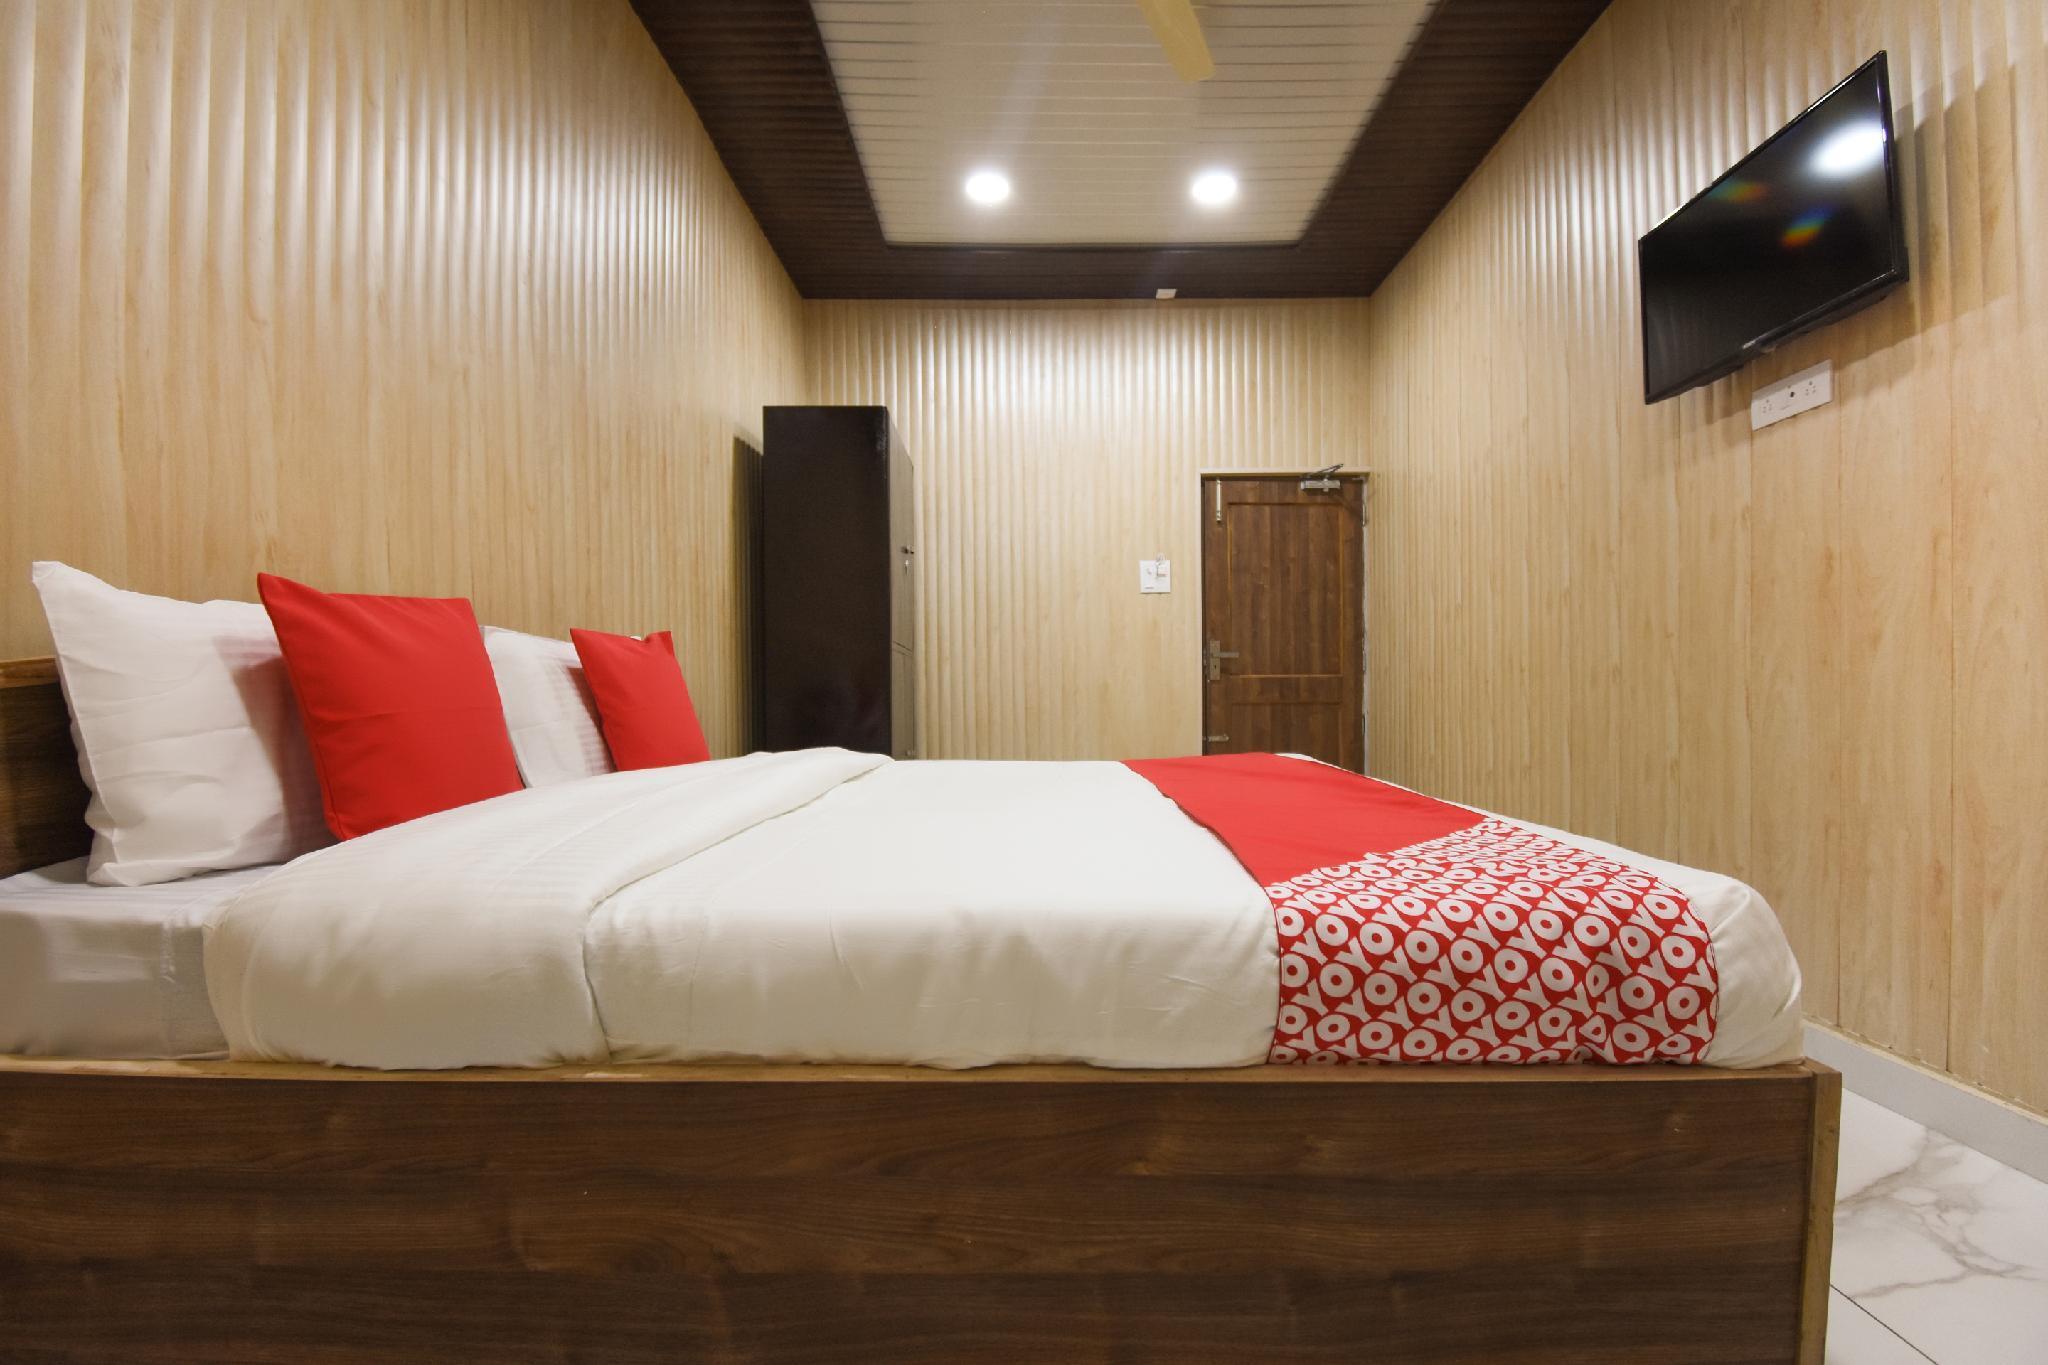 OYO 62786 New Delhi Guest House